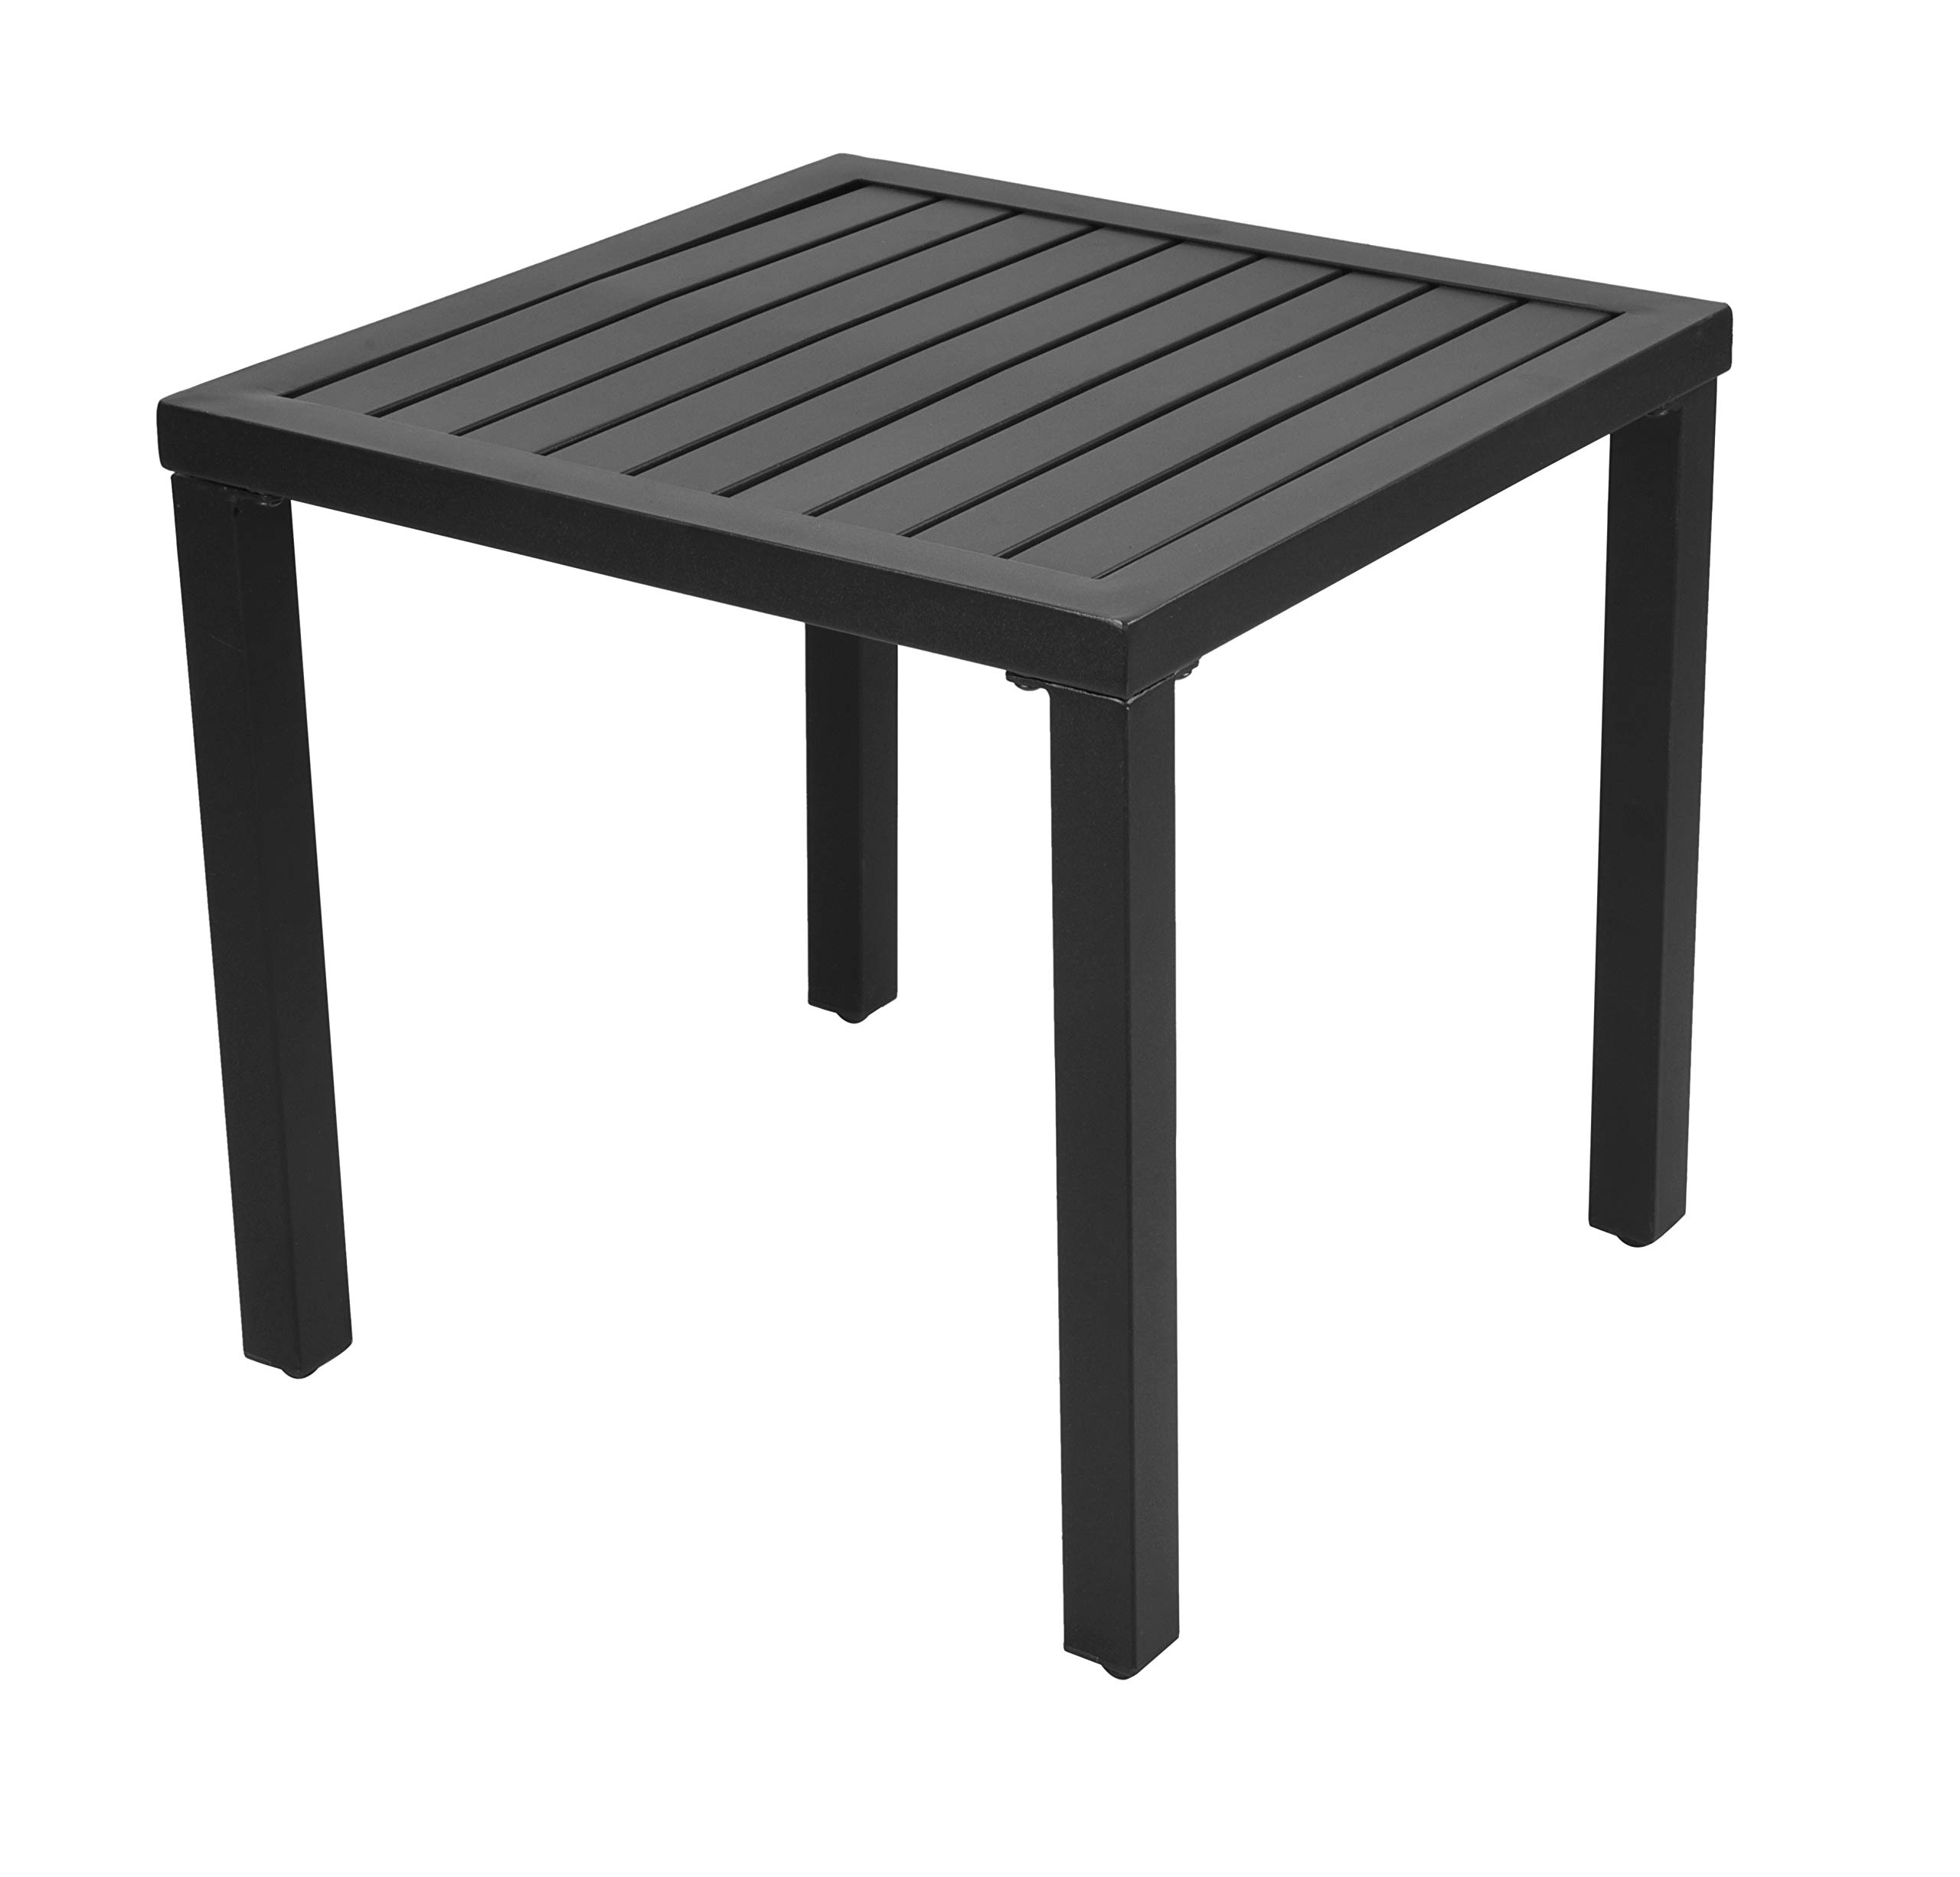 EMERIT Outdoor Metal Square Patio Bistro Side End Table,Black